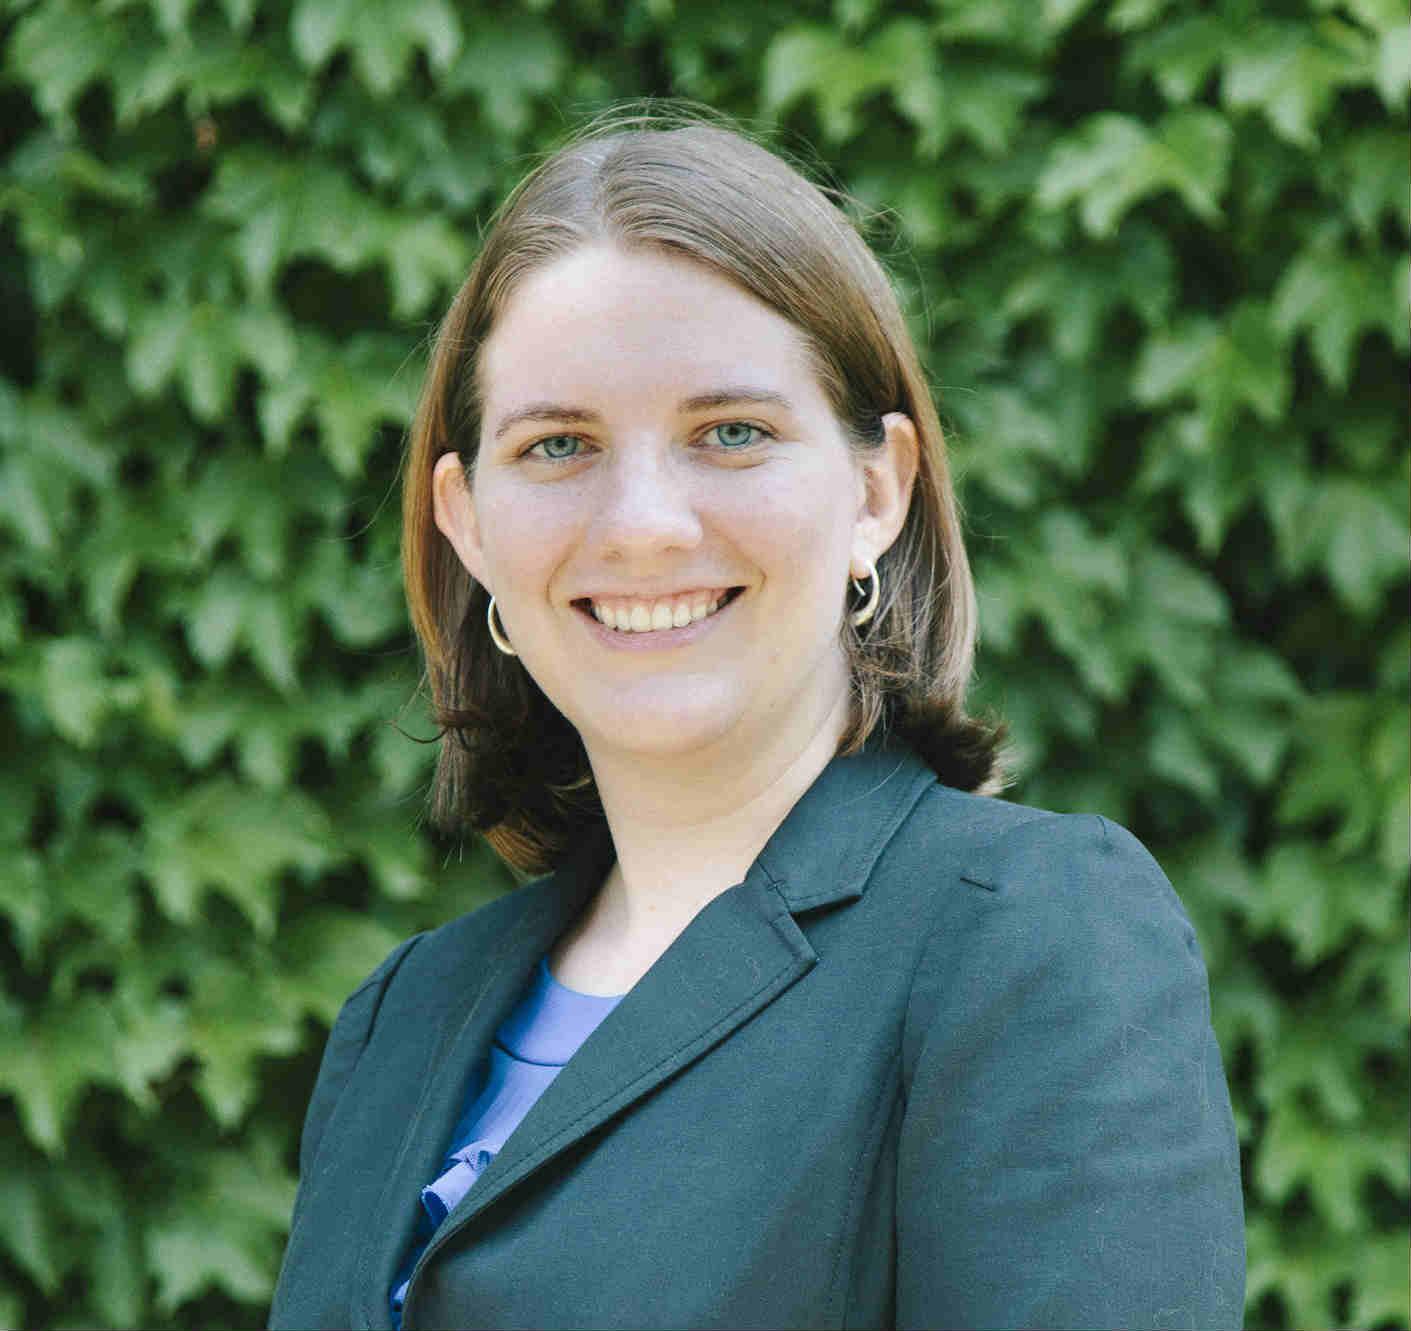 PRC Brown Bag: Visiting Demographer Alexandra Killewald from Harvard